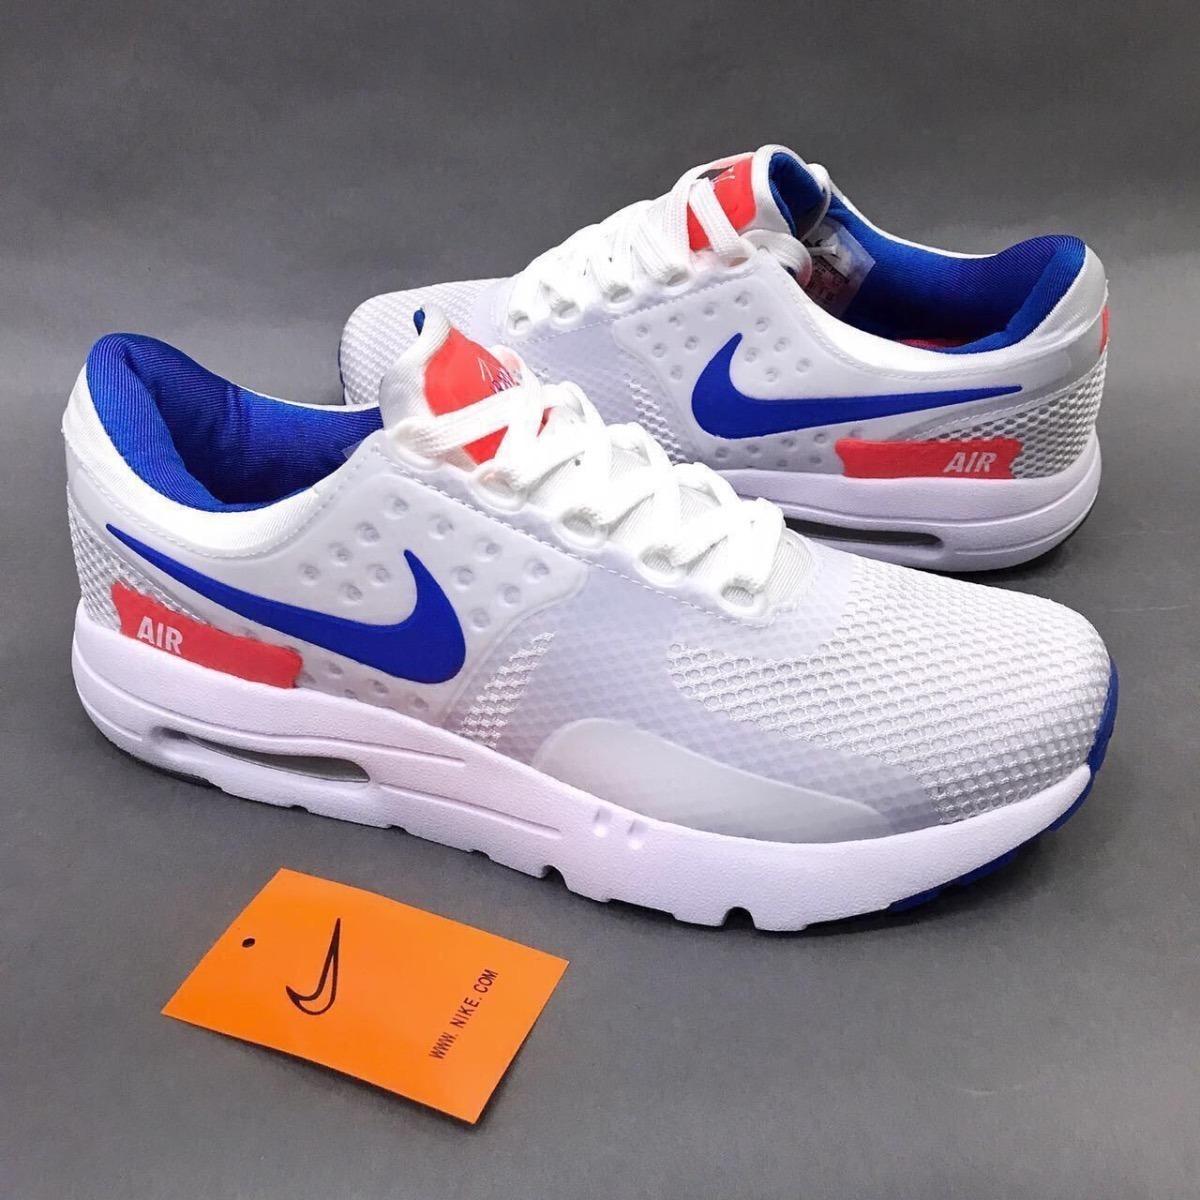 6a4b674535486 Tenis Zapatillas Nike Air Max Zero Blanca Azul Hombre -   144.900 en ...